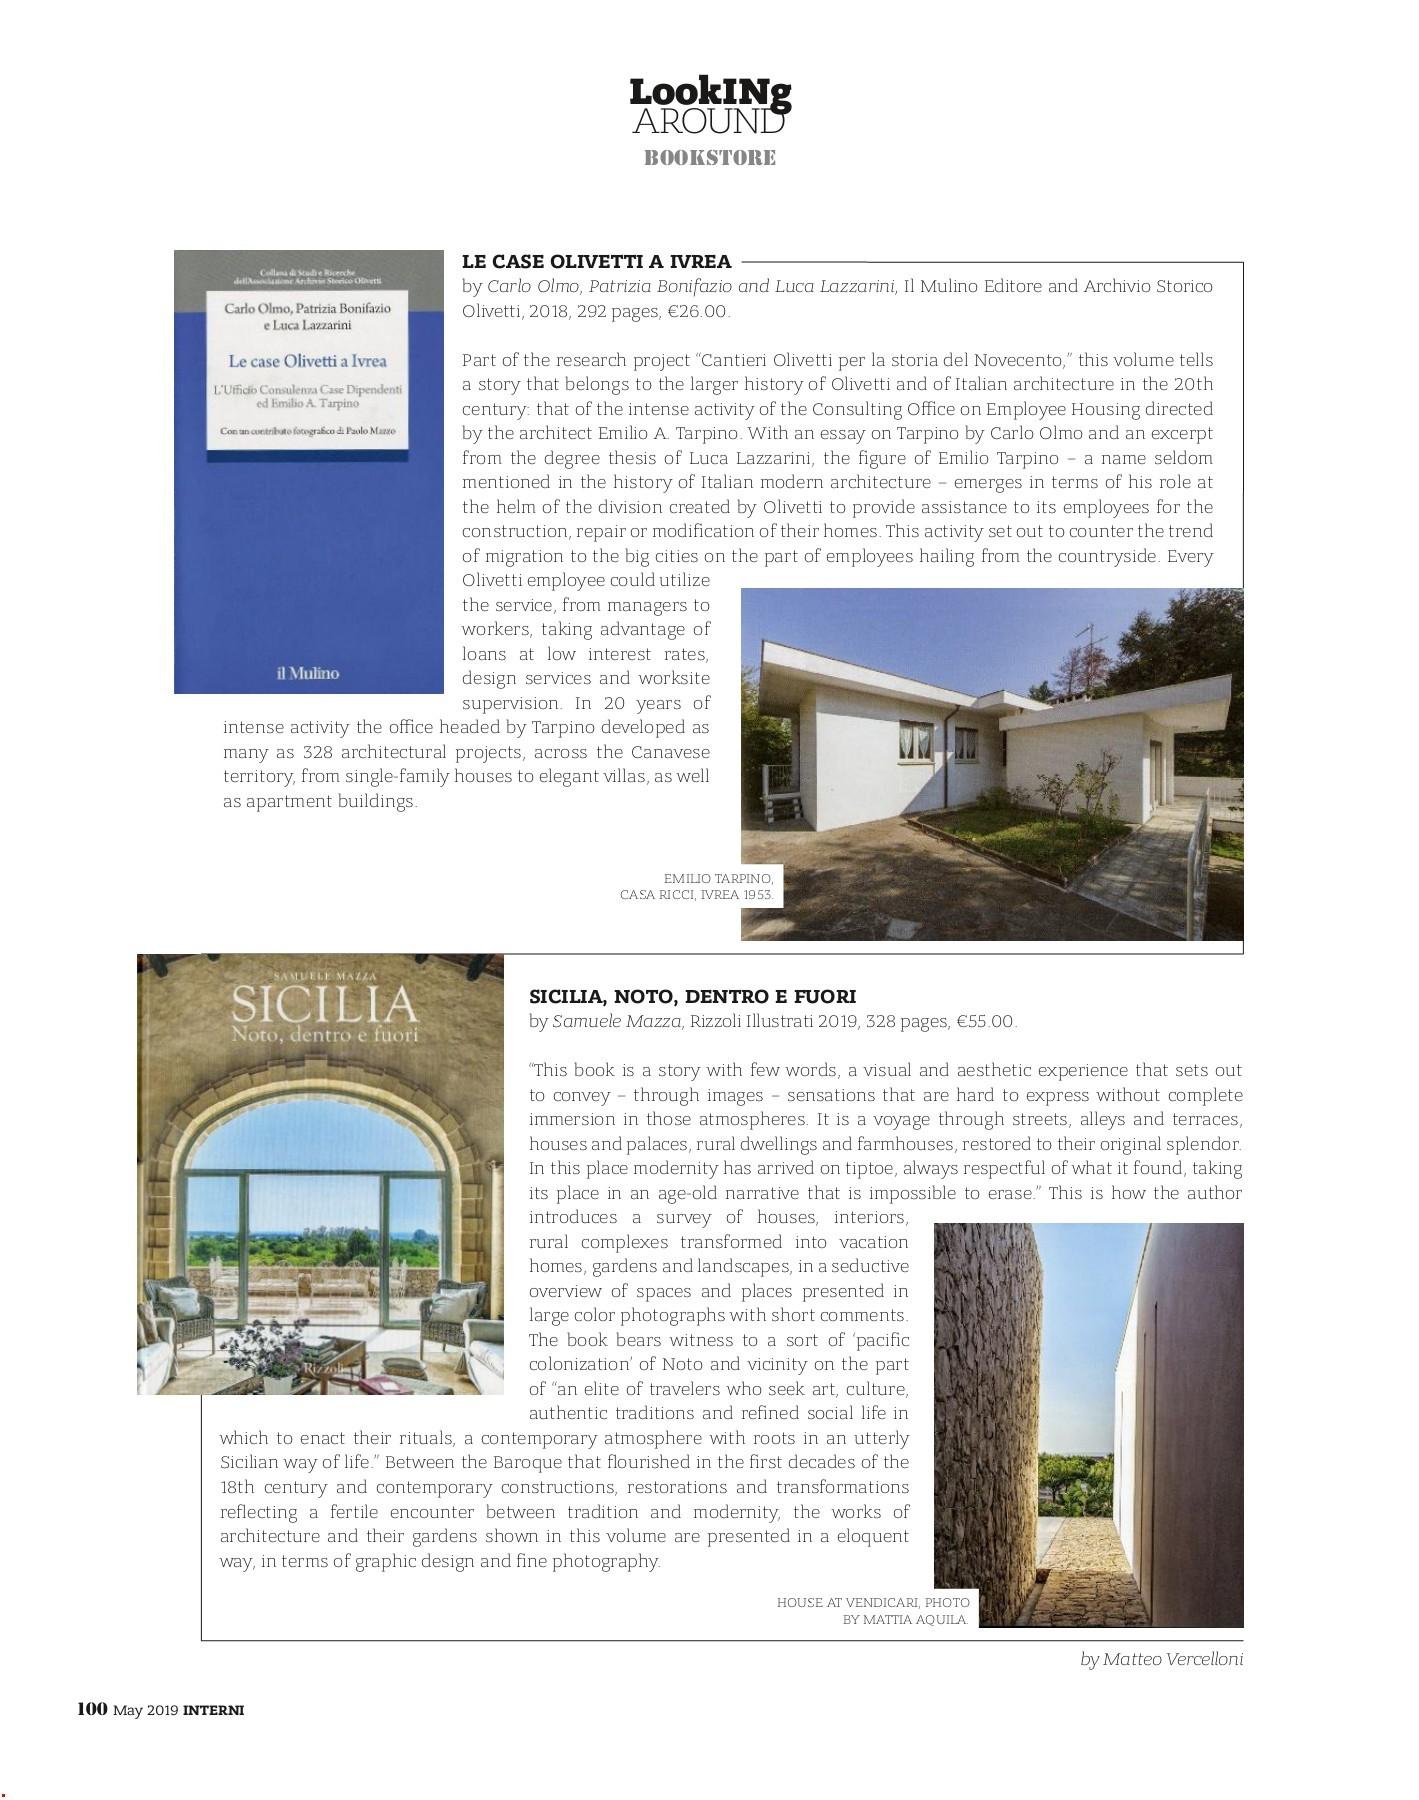 Candelabri Maison Du Monde interni_italia__maggio_2019-flip book pages 101-150 | pubhtml5